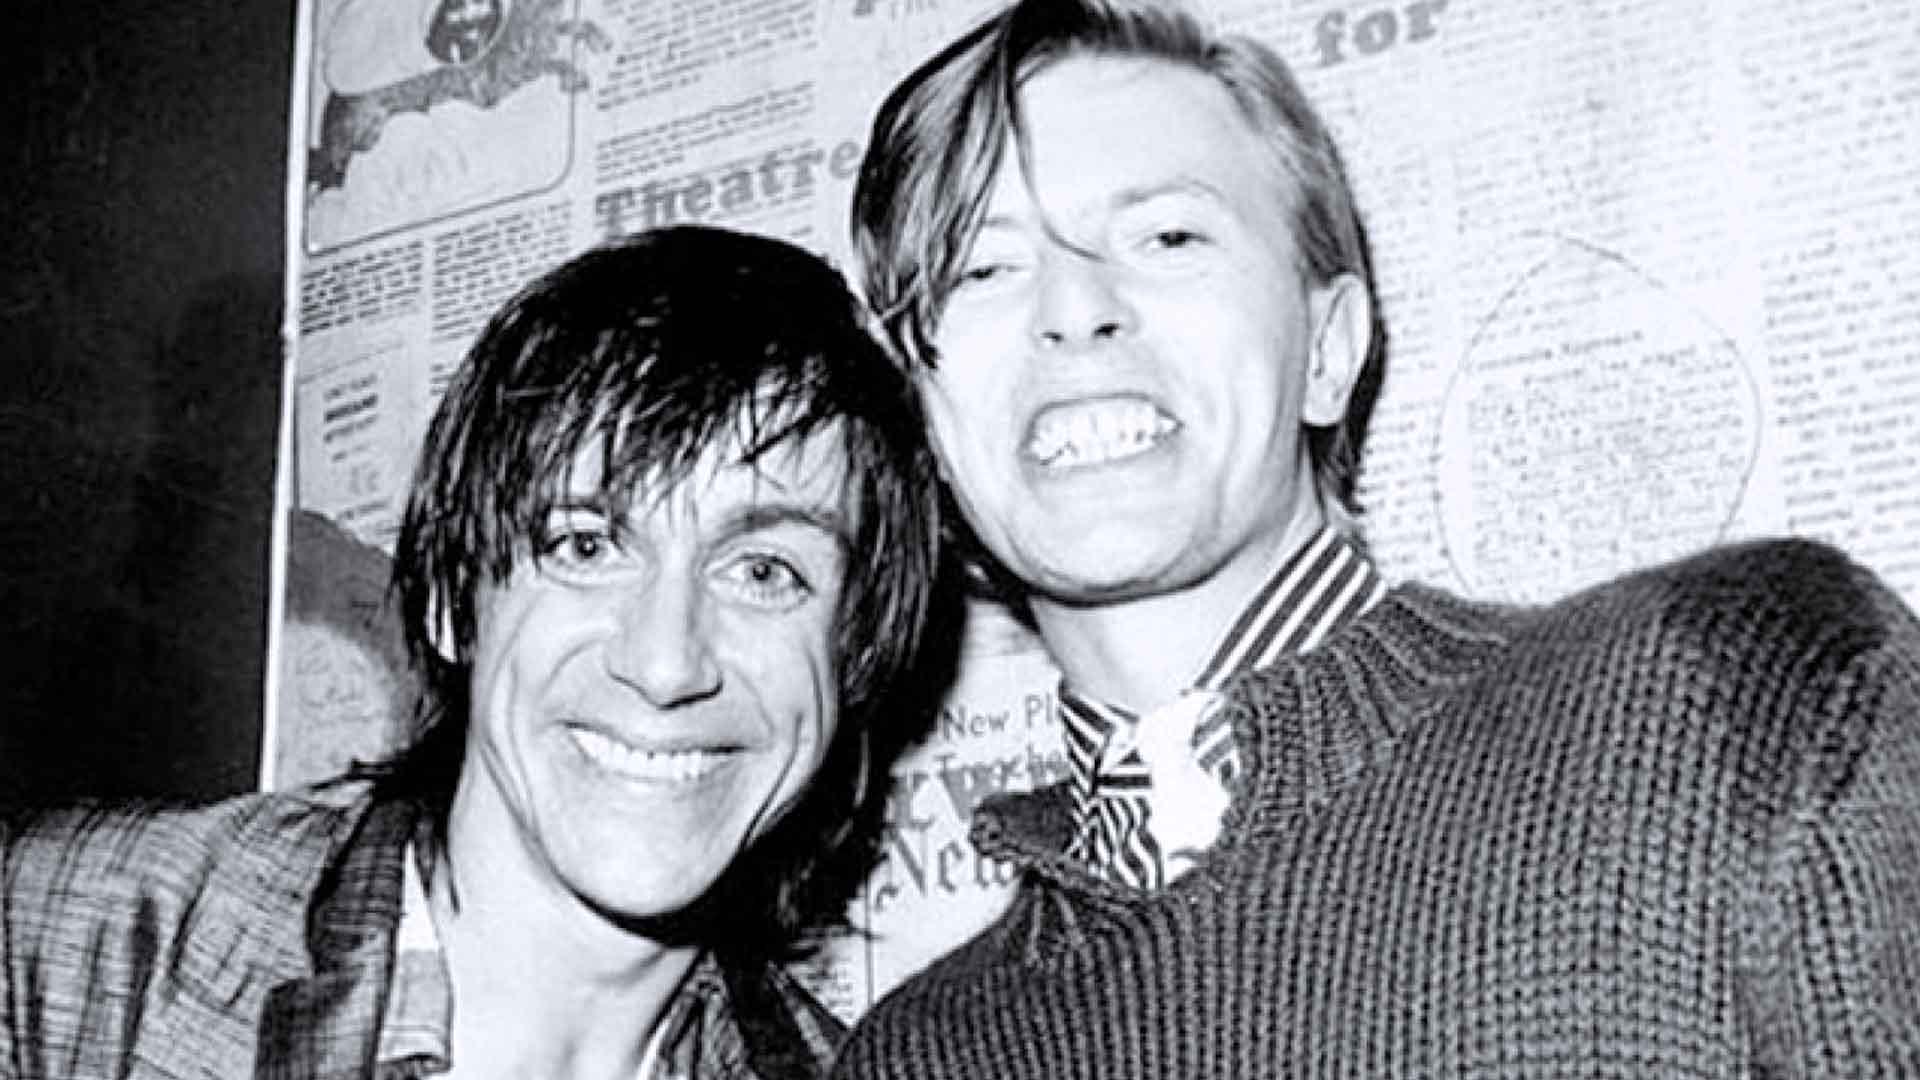 David Bowie salvò Iggy Pop a Berlino